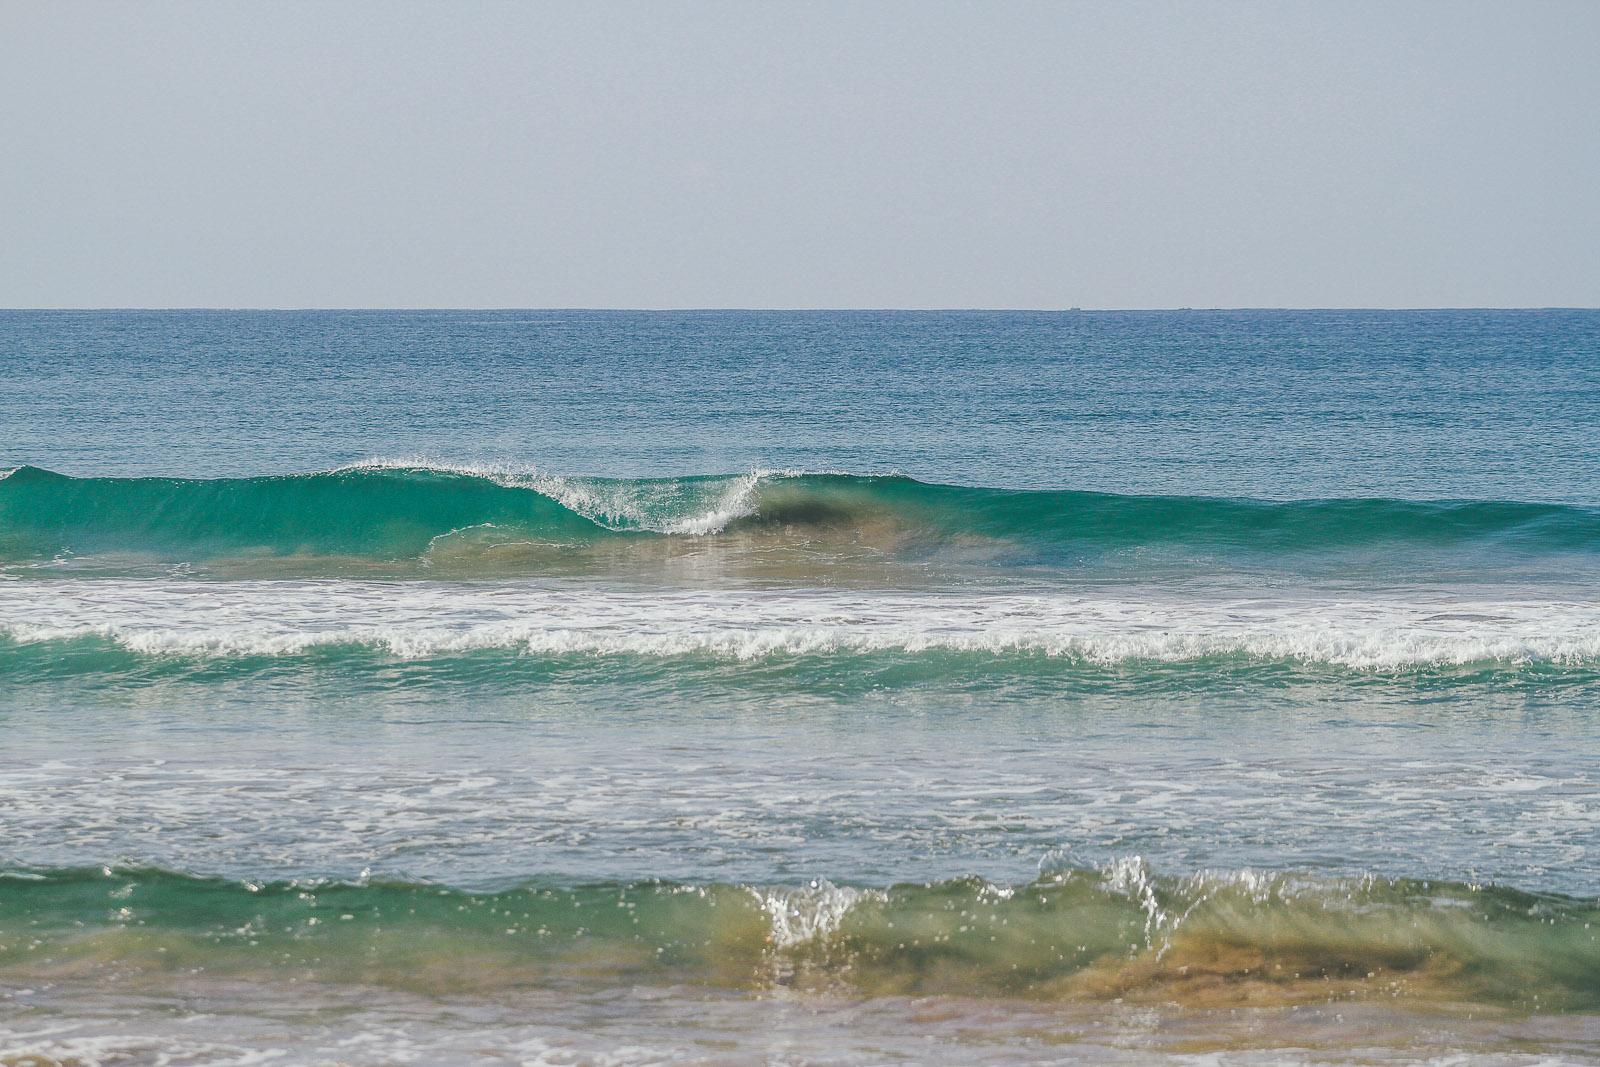 Sunshinestories-Sri-Lanka-Medawatta-Medawata-Meda-Watta-Mada-surf-Lonboard-Surfing-Wave-Surf-School-Camp-Yoga-Studio-IMG_9985